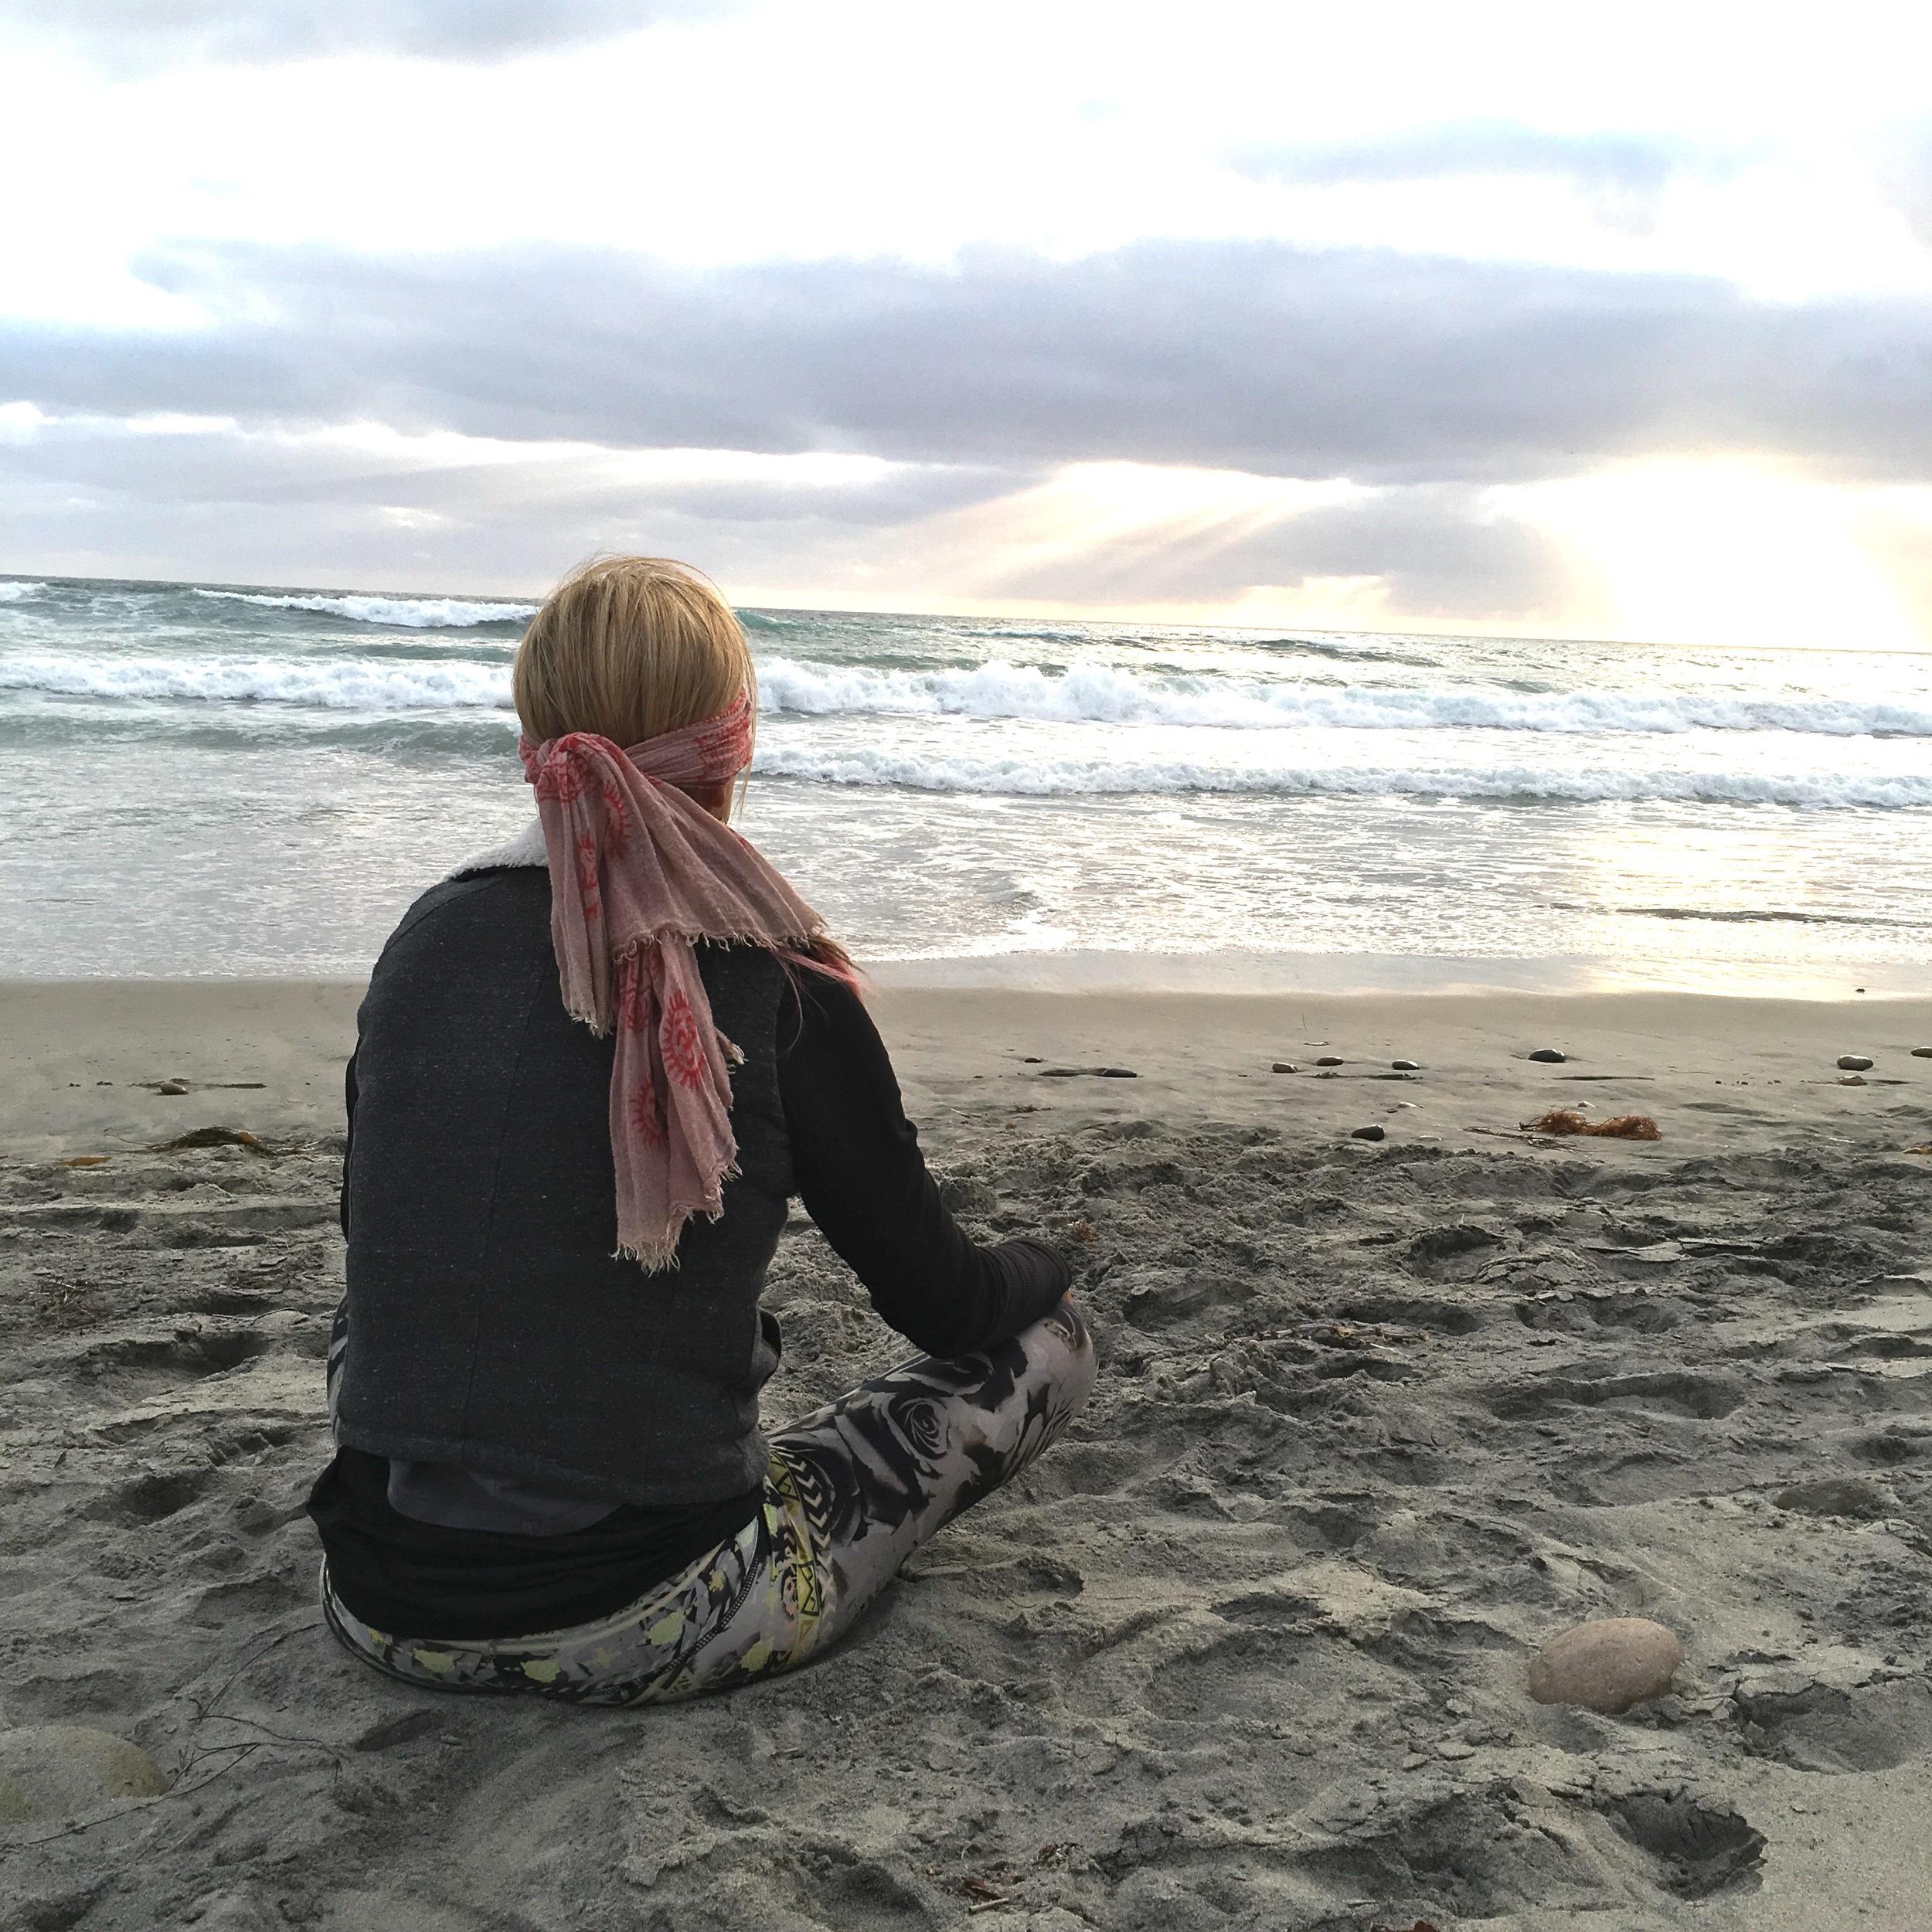 Beach blindfolds2.jpeg